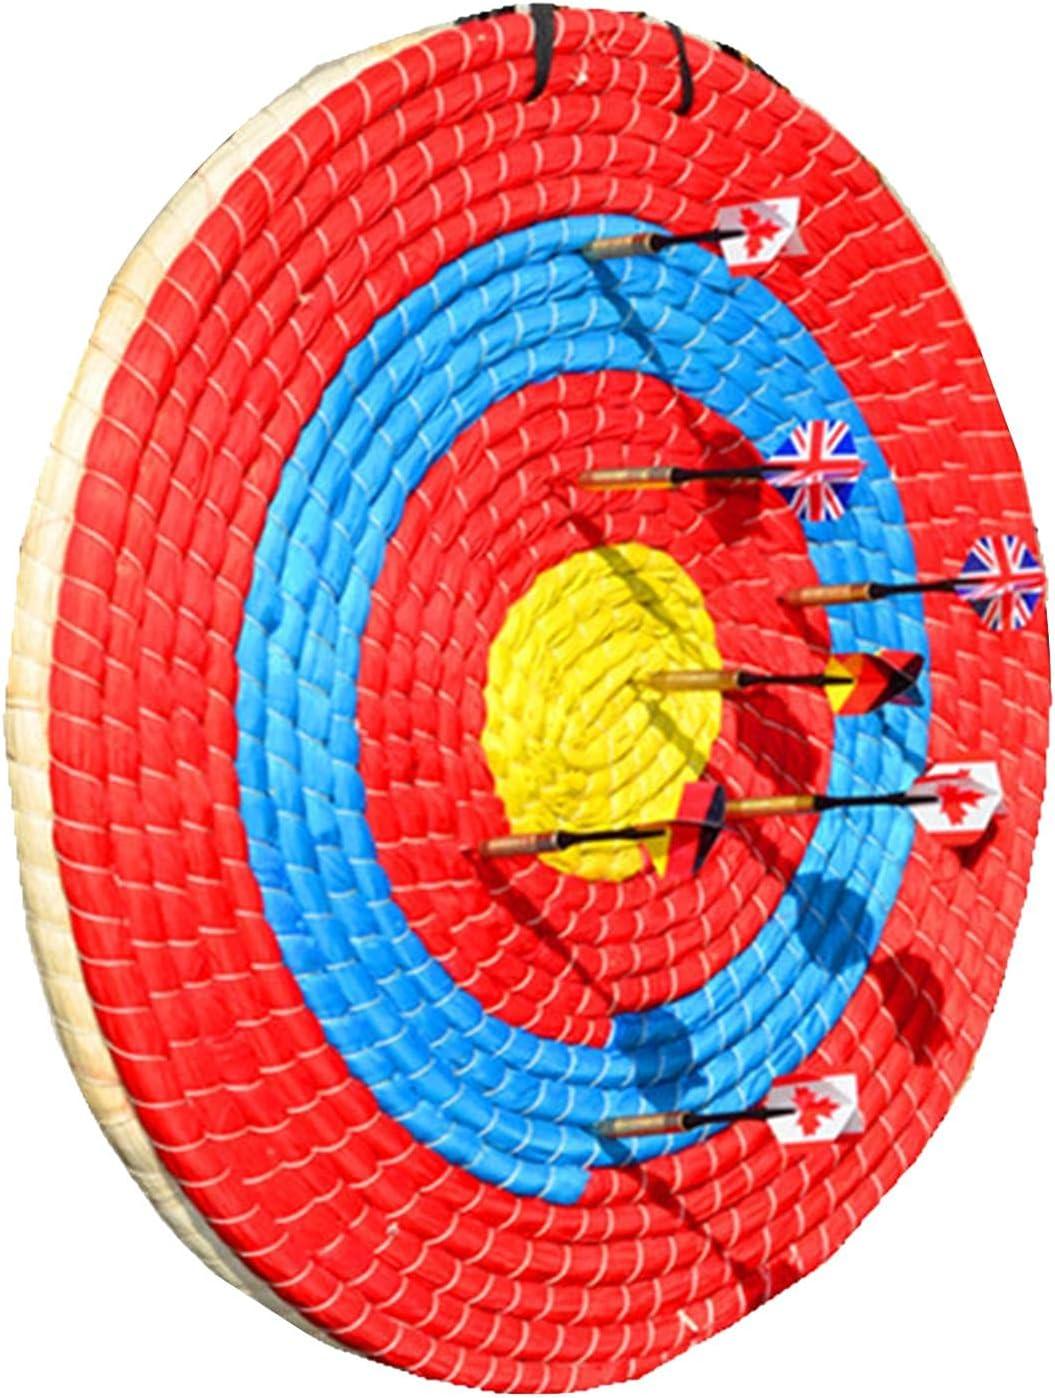 Nippon regular online shopping agency Interesty Archery Targets Handmade Straw Traditio Target